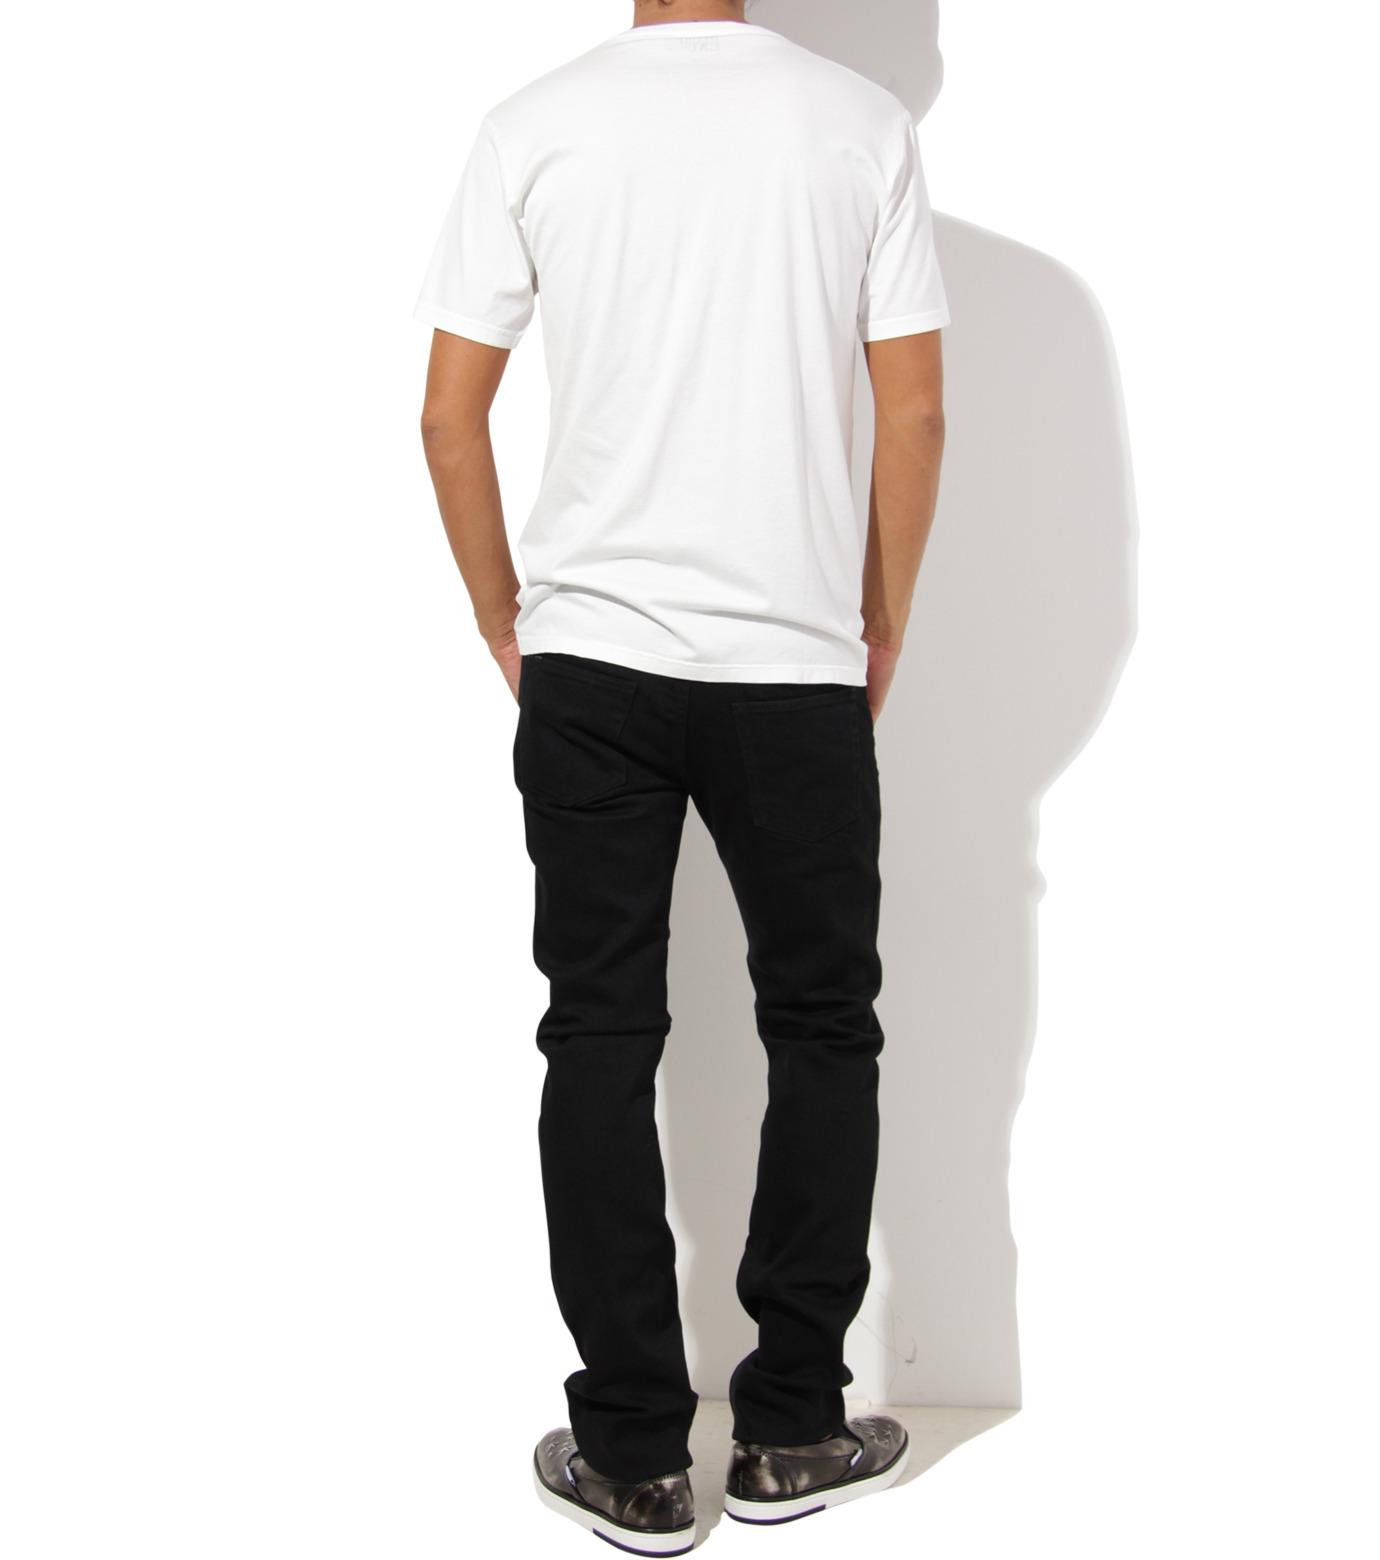 Heddie Lovu(エディー ルーヴ)のV NECK 【MACHO】-WHITE(カットソー/cut and sewn)-ST-M2-00-14A 拡大詳細画像4